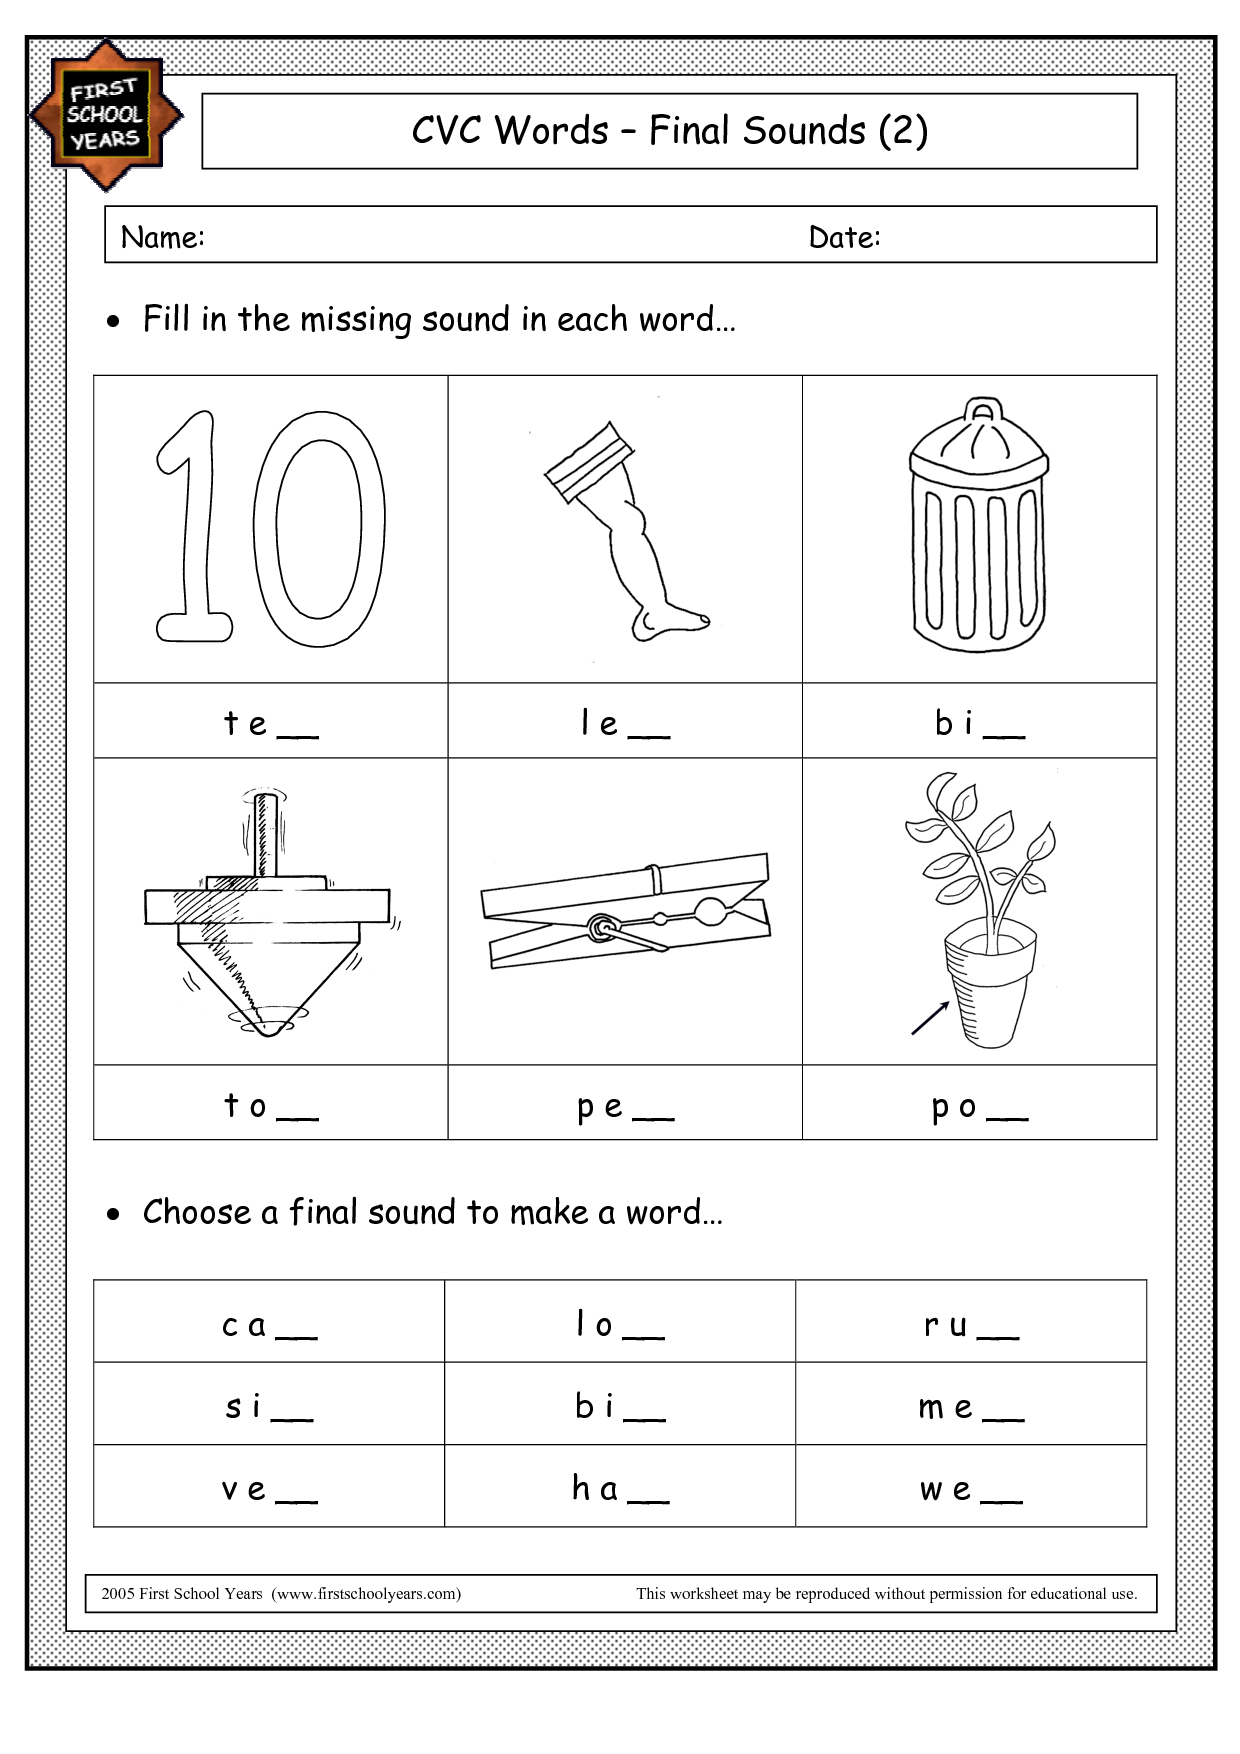 Ending Sound Worksheet Cvc Words Pinterest Worksheets Phonics